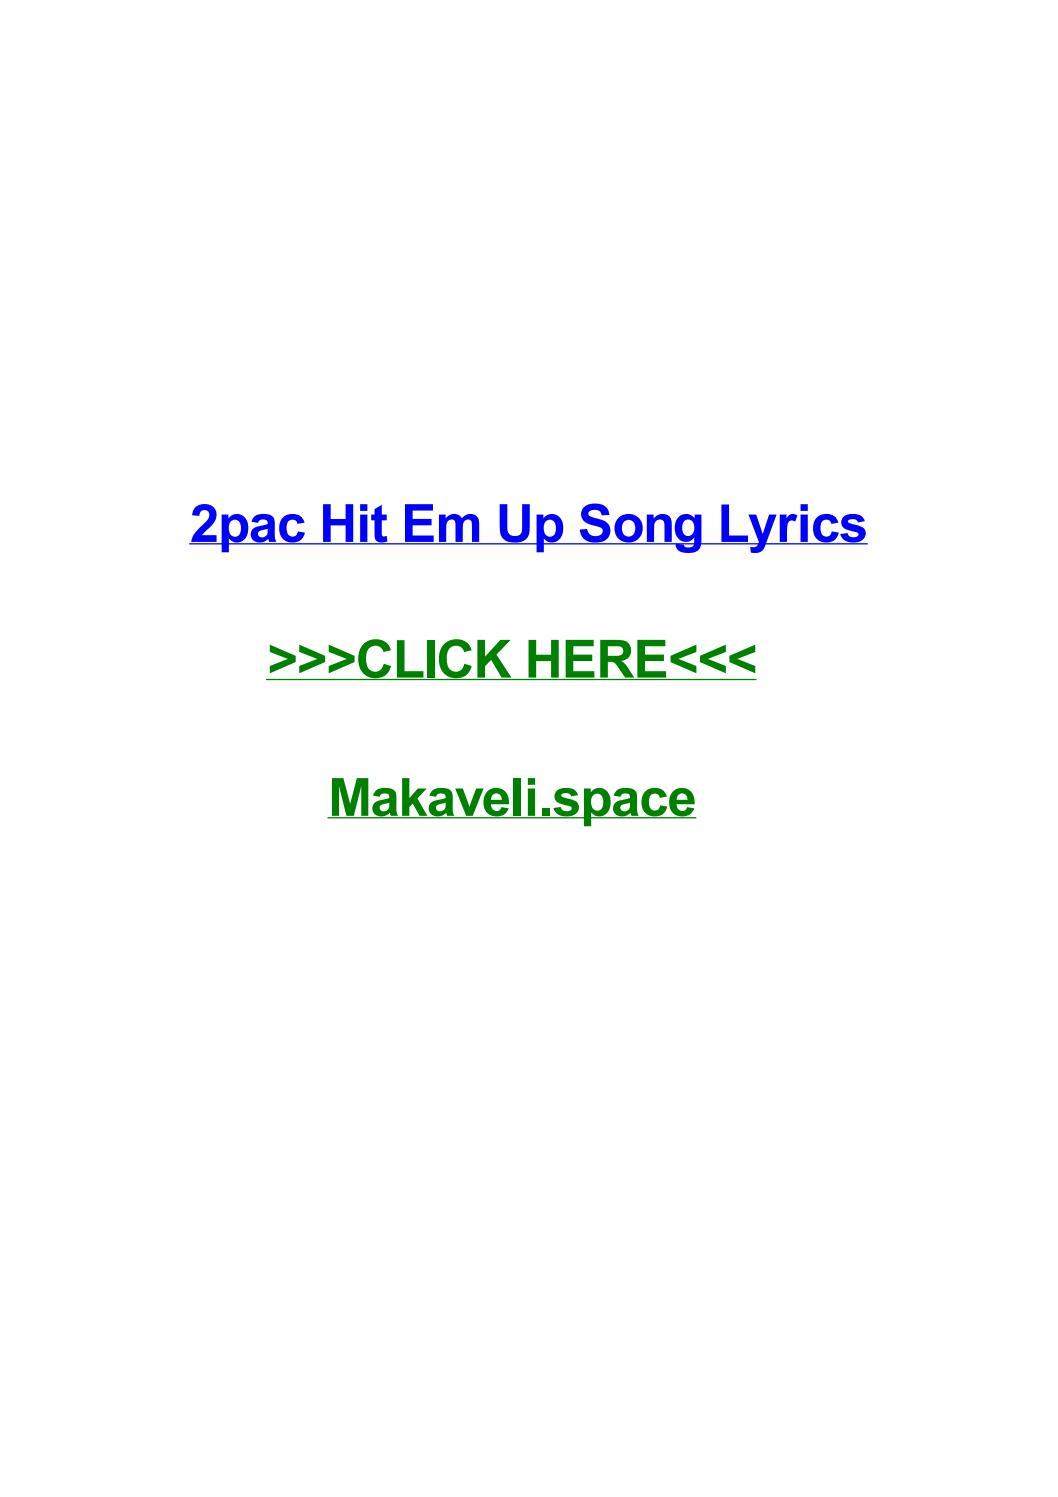 2pac hit em up song lyrics by bryancrejn - issuu